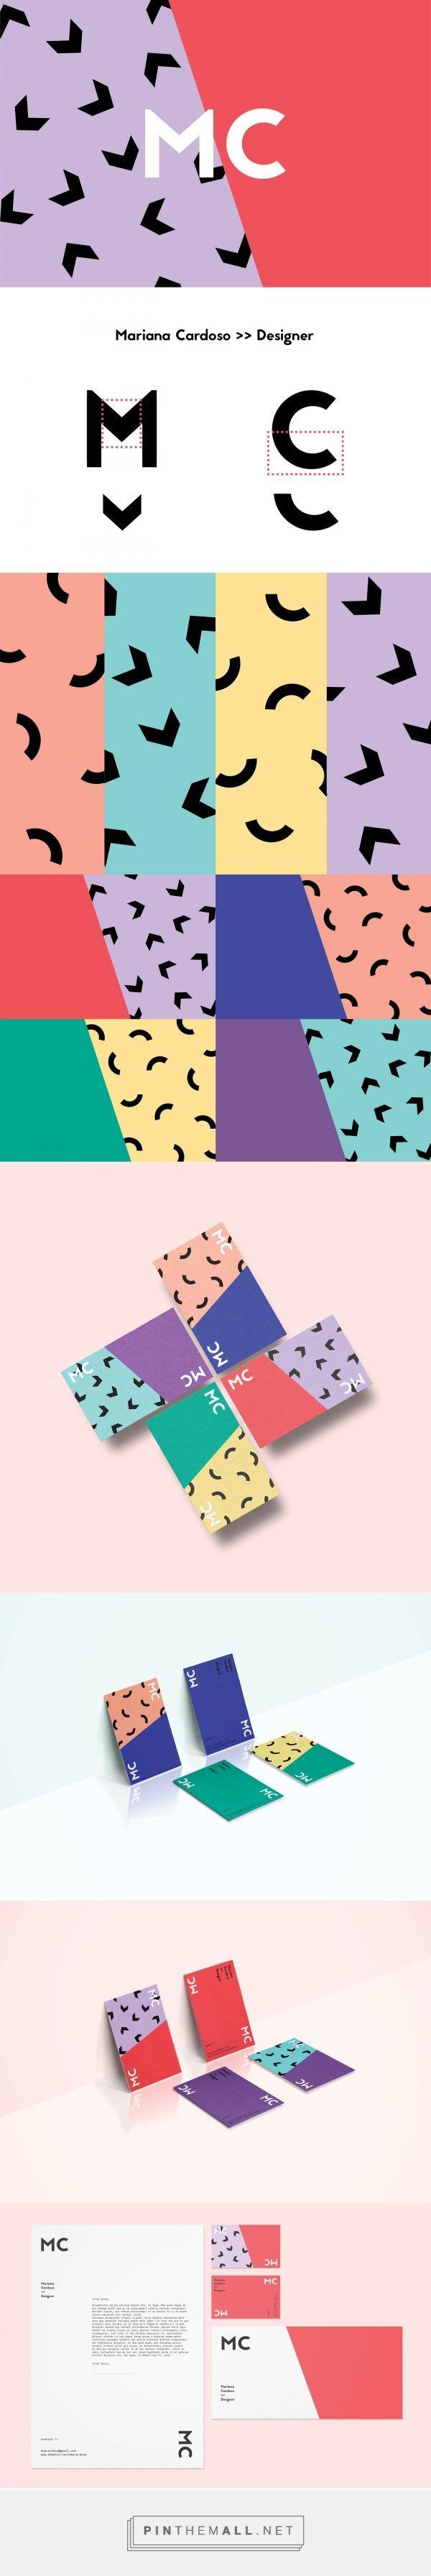 Personal Identity - Mariana Cardoso on Behance | Fivestar Branding – Design and Branding Agency & Inspiration Gallery